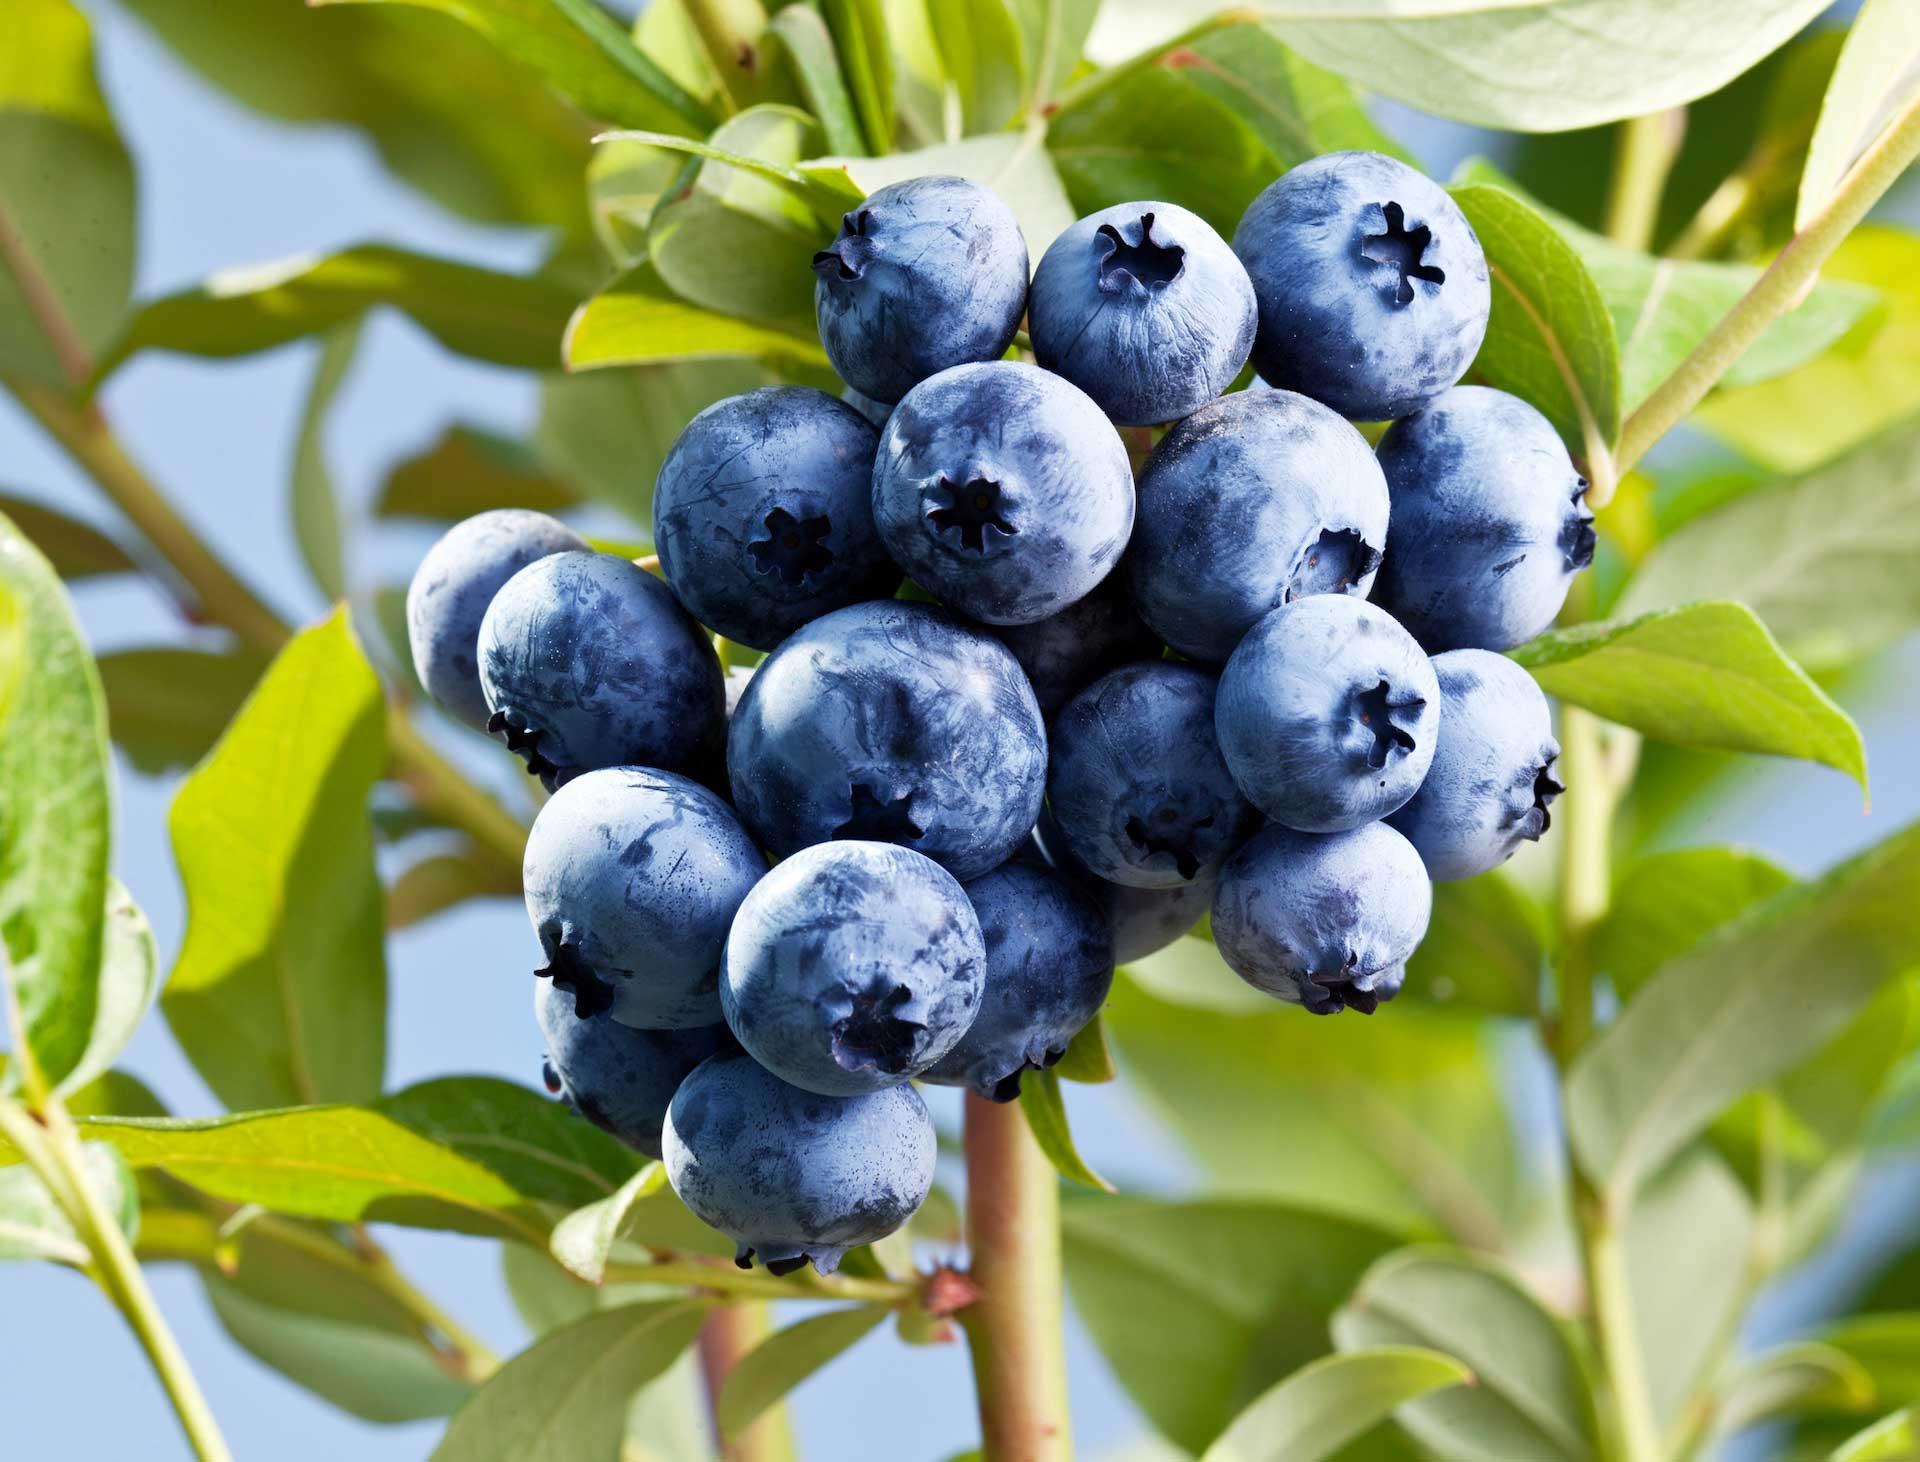 macro shot of blueberries on a shrub